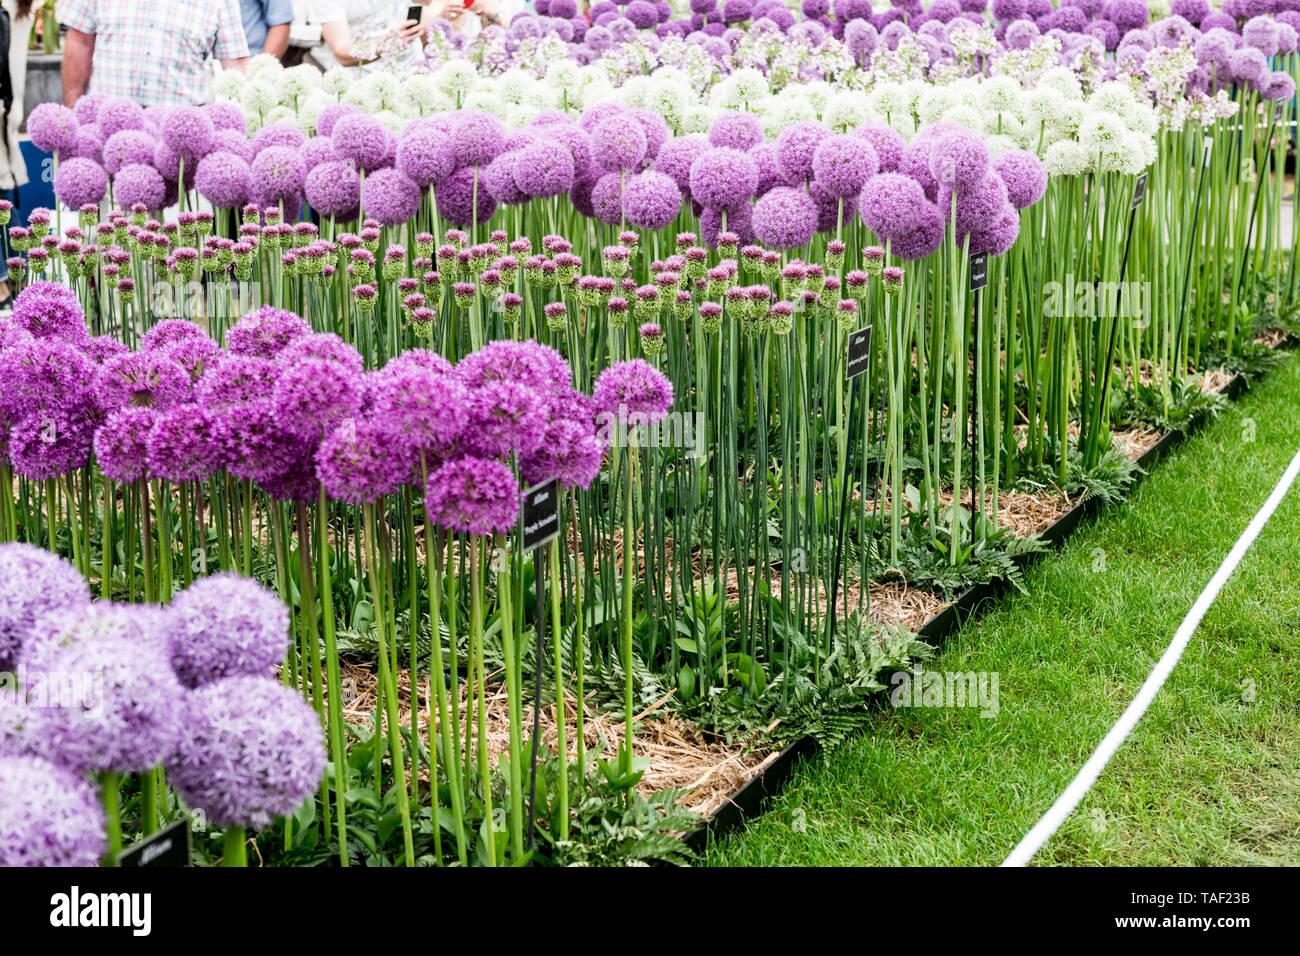 Allium Flowers at The Chelsea Flower Show 2019 London UK - Stock Image